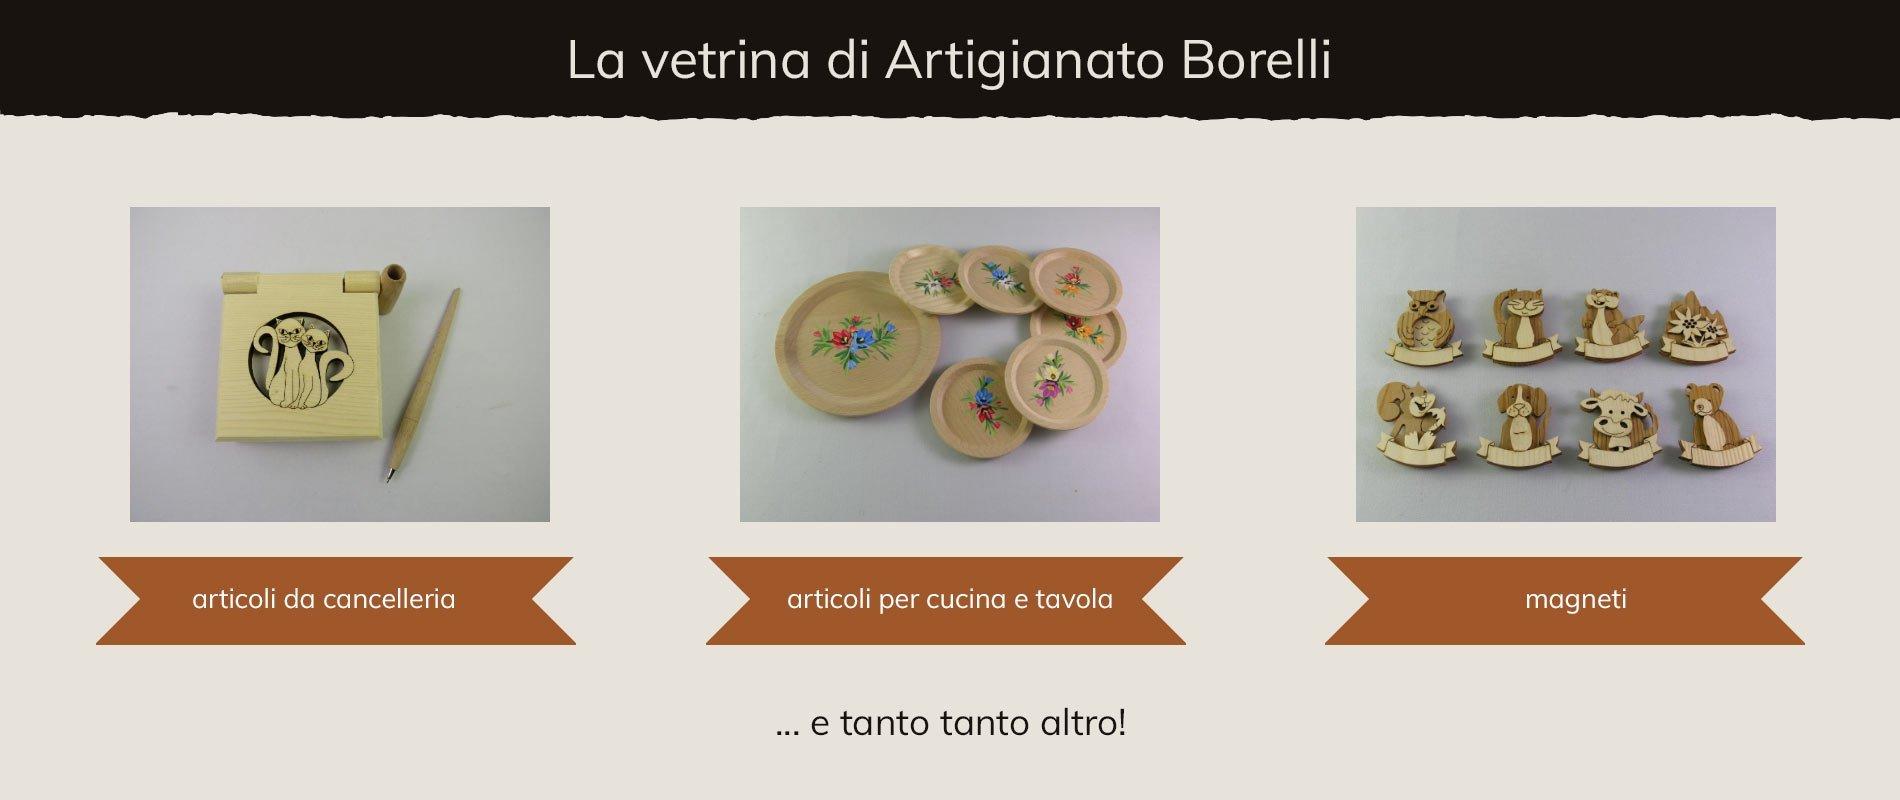 Artigianato Borelli